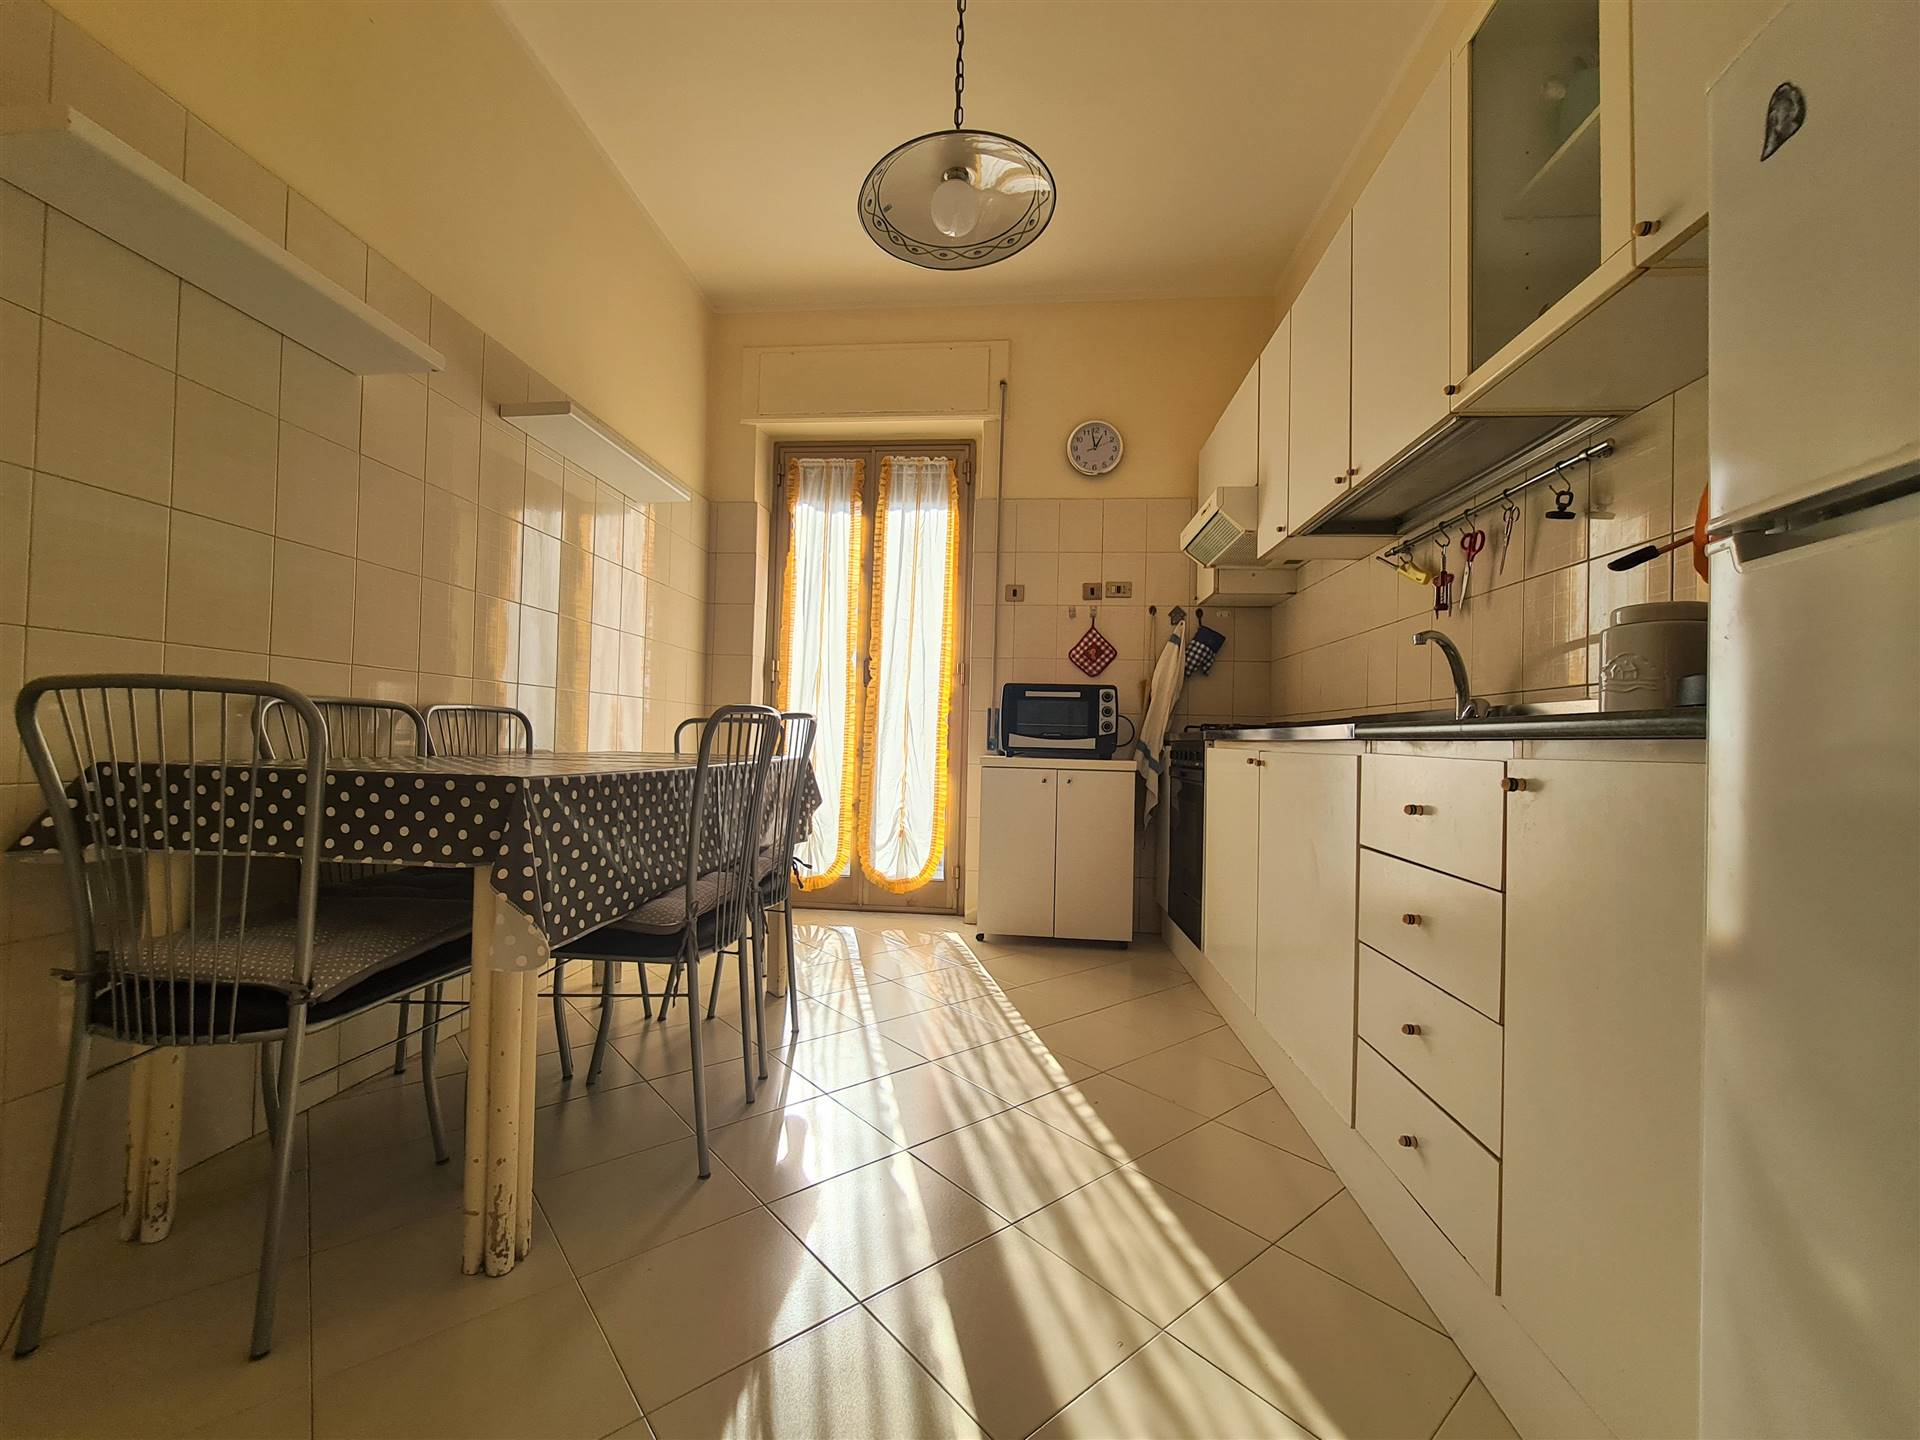 AV924D-Appartamento-SANTA-MARIA-CAPUA-VETERE-Via-Luigi-De-Michele-